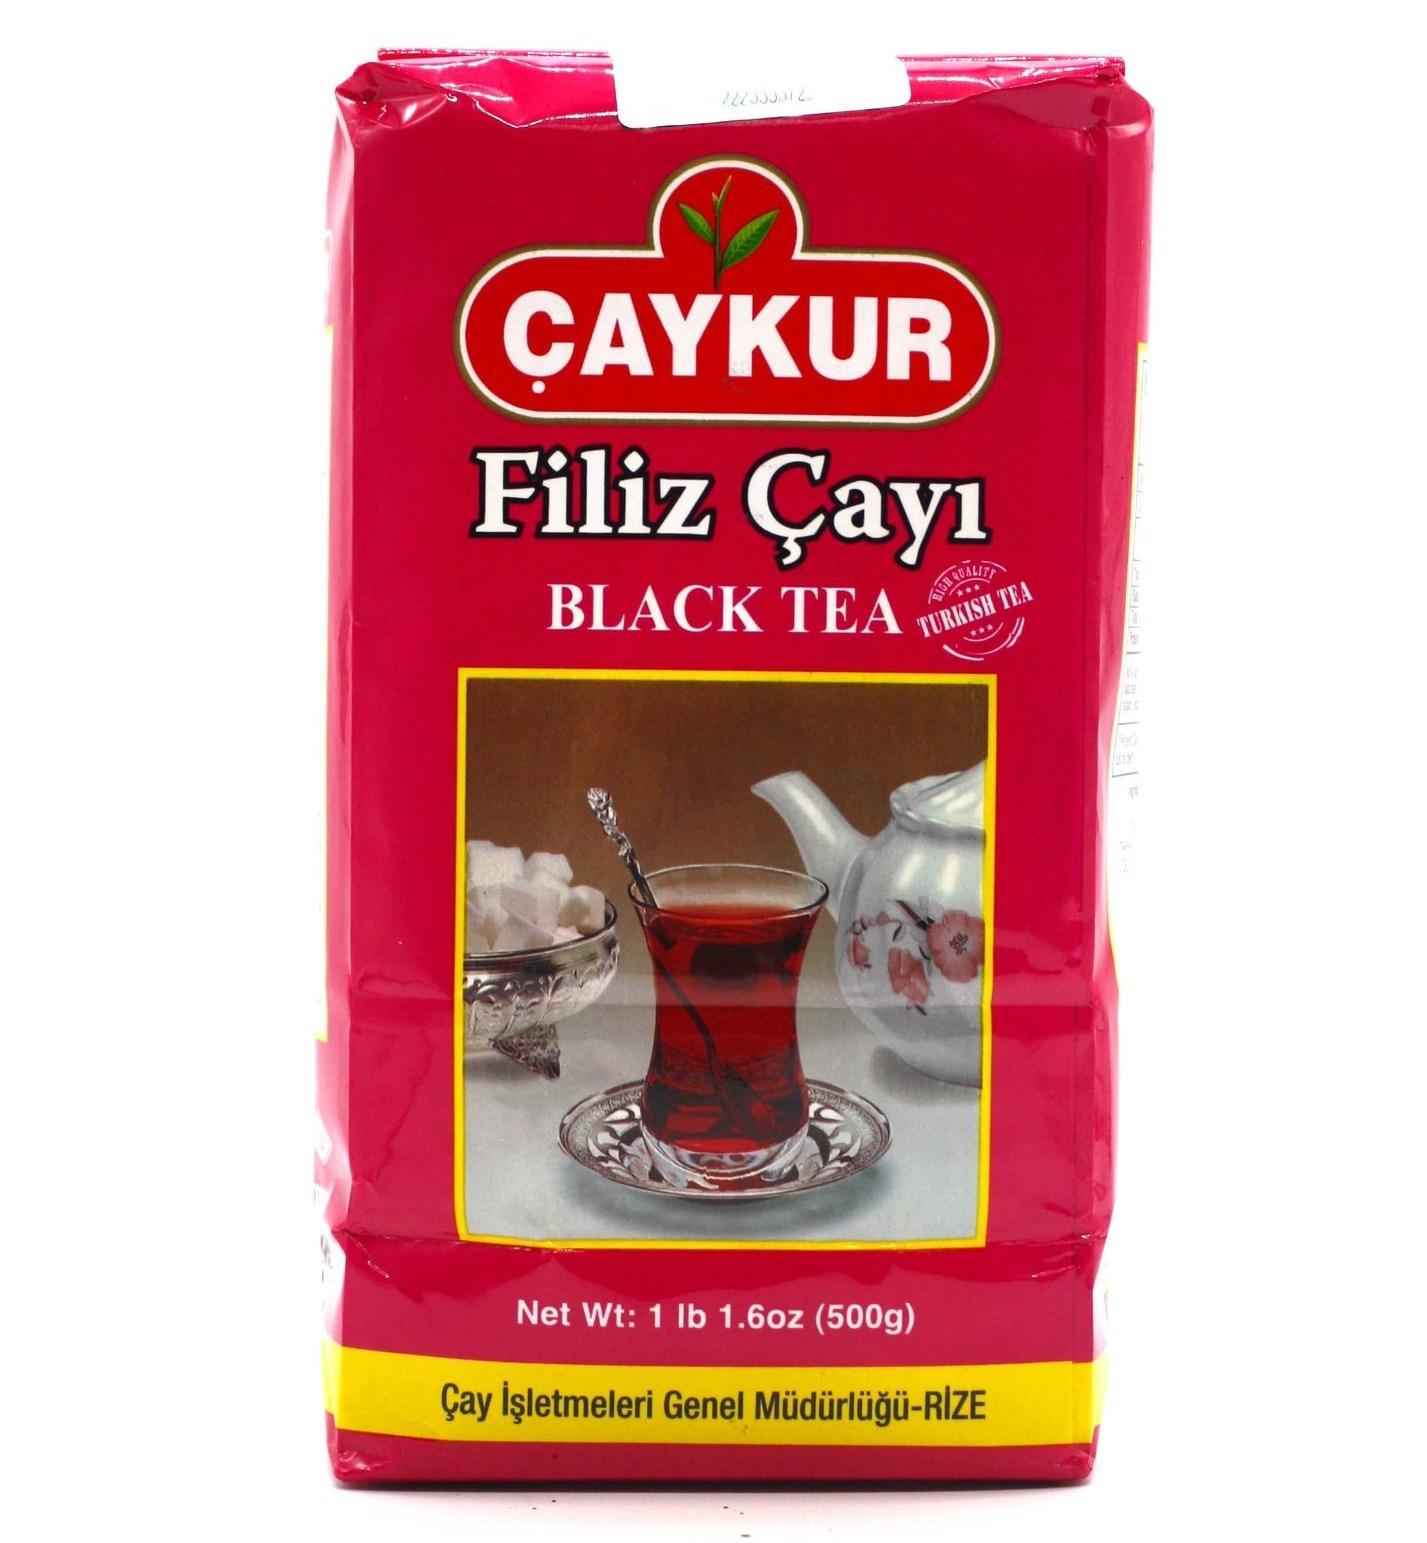 Чай Турецкий черный чай Filiz, Çaykur, 500 г import_files_a0_a058a49ca51711e8a99c484d7ecee297_7b9d99b9366e11e9a9a6484d7ecee297.jpg